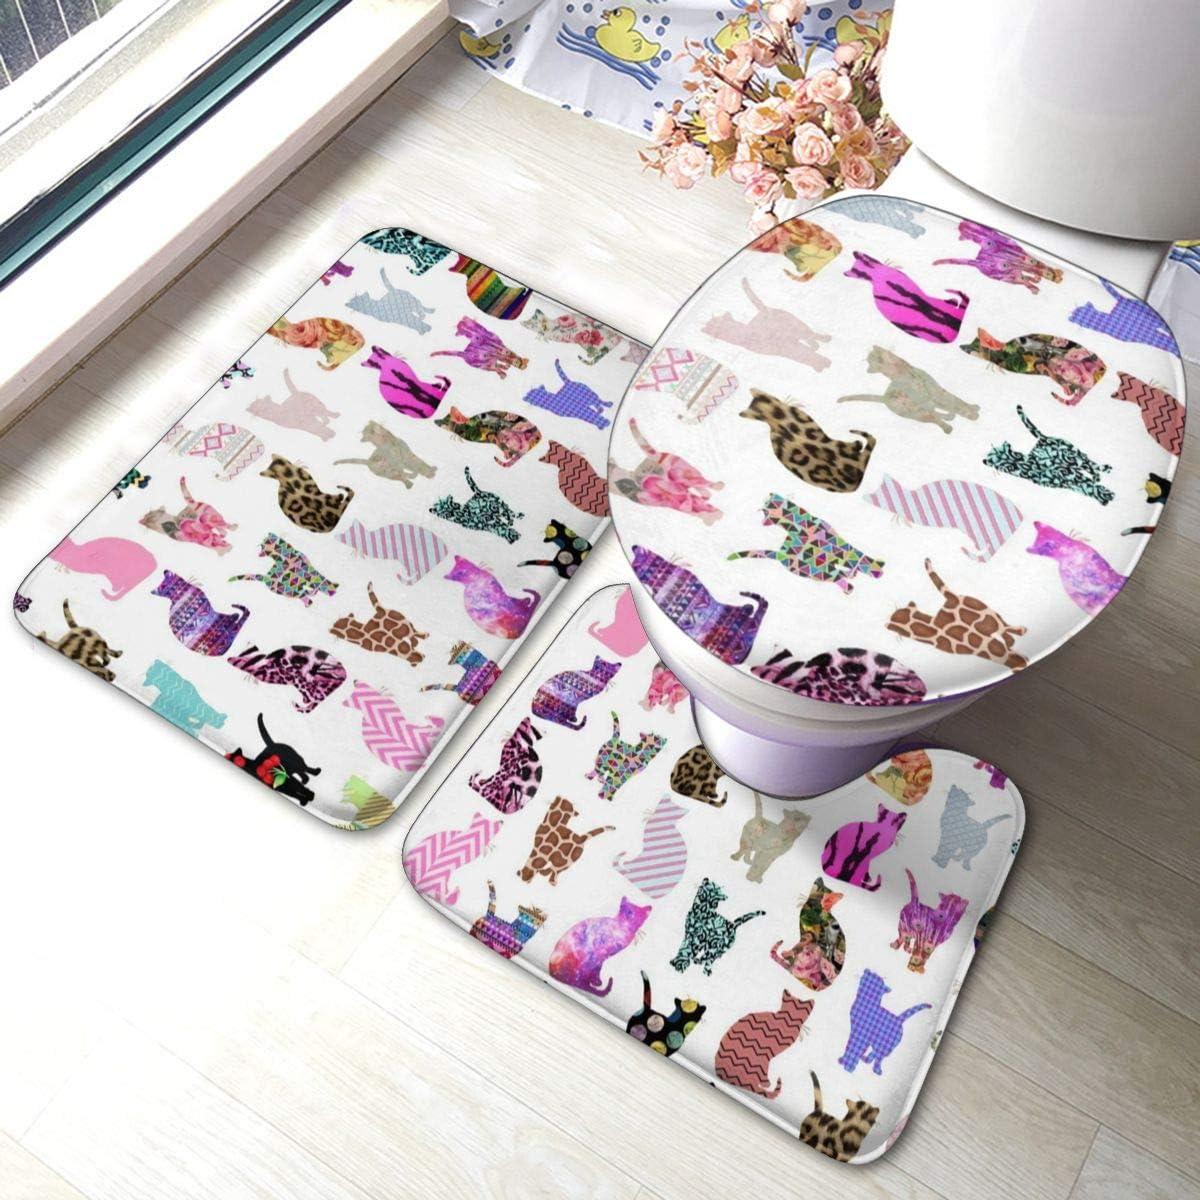 Uliykon Motivo: Teschio Gatto e Luna Set di 3 tappetini da Bagno in Memory Foam